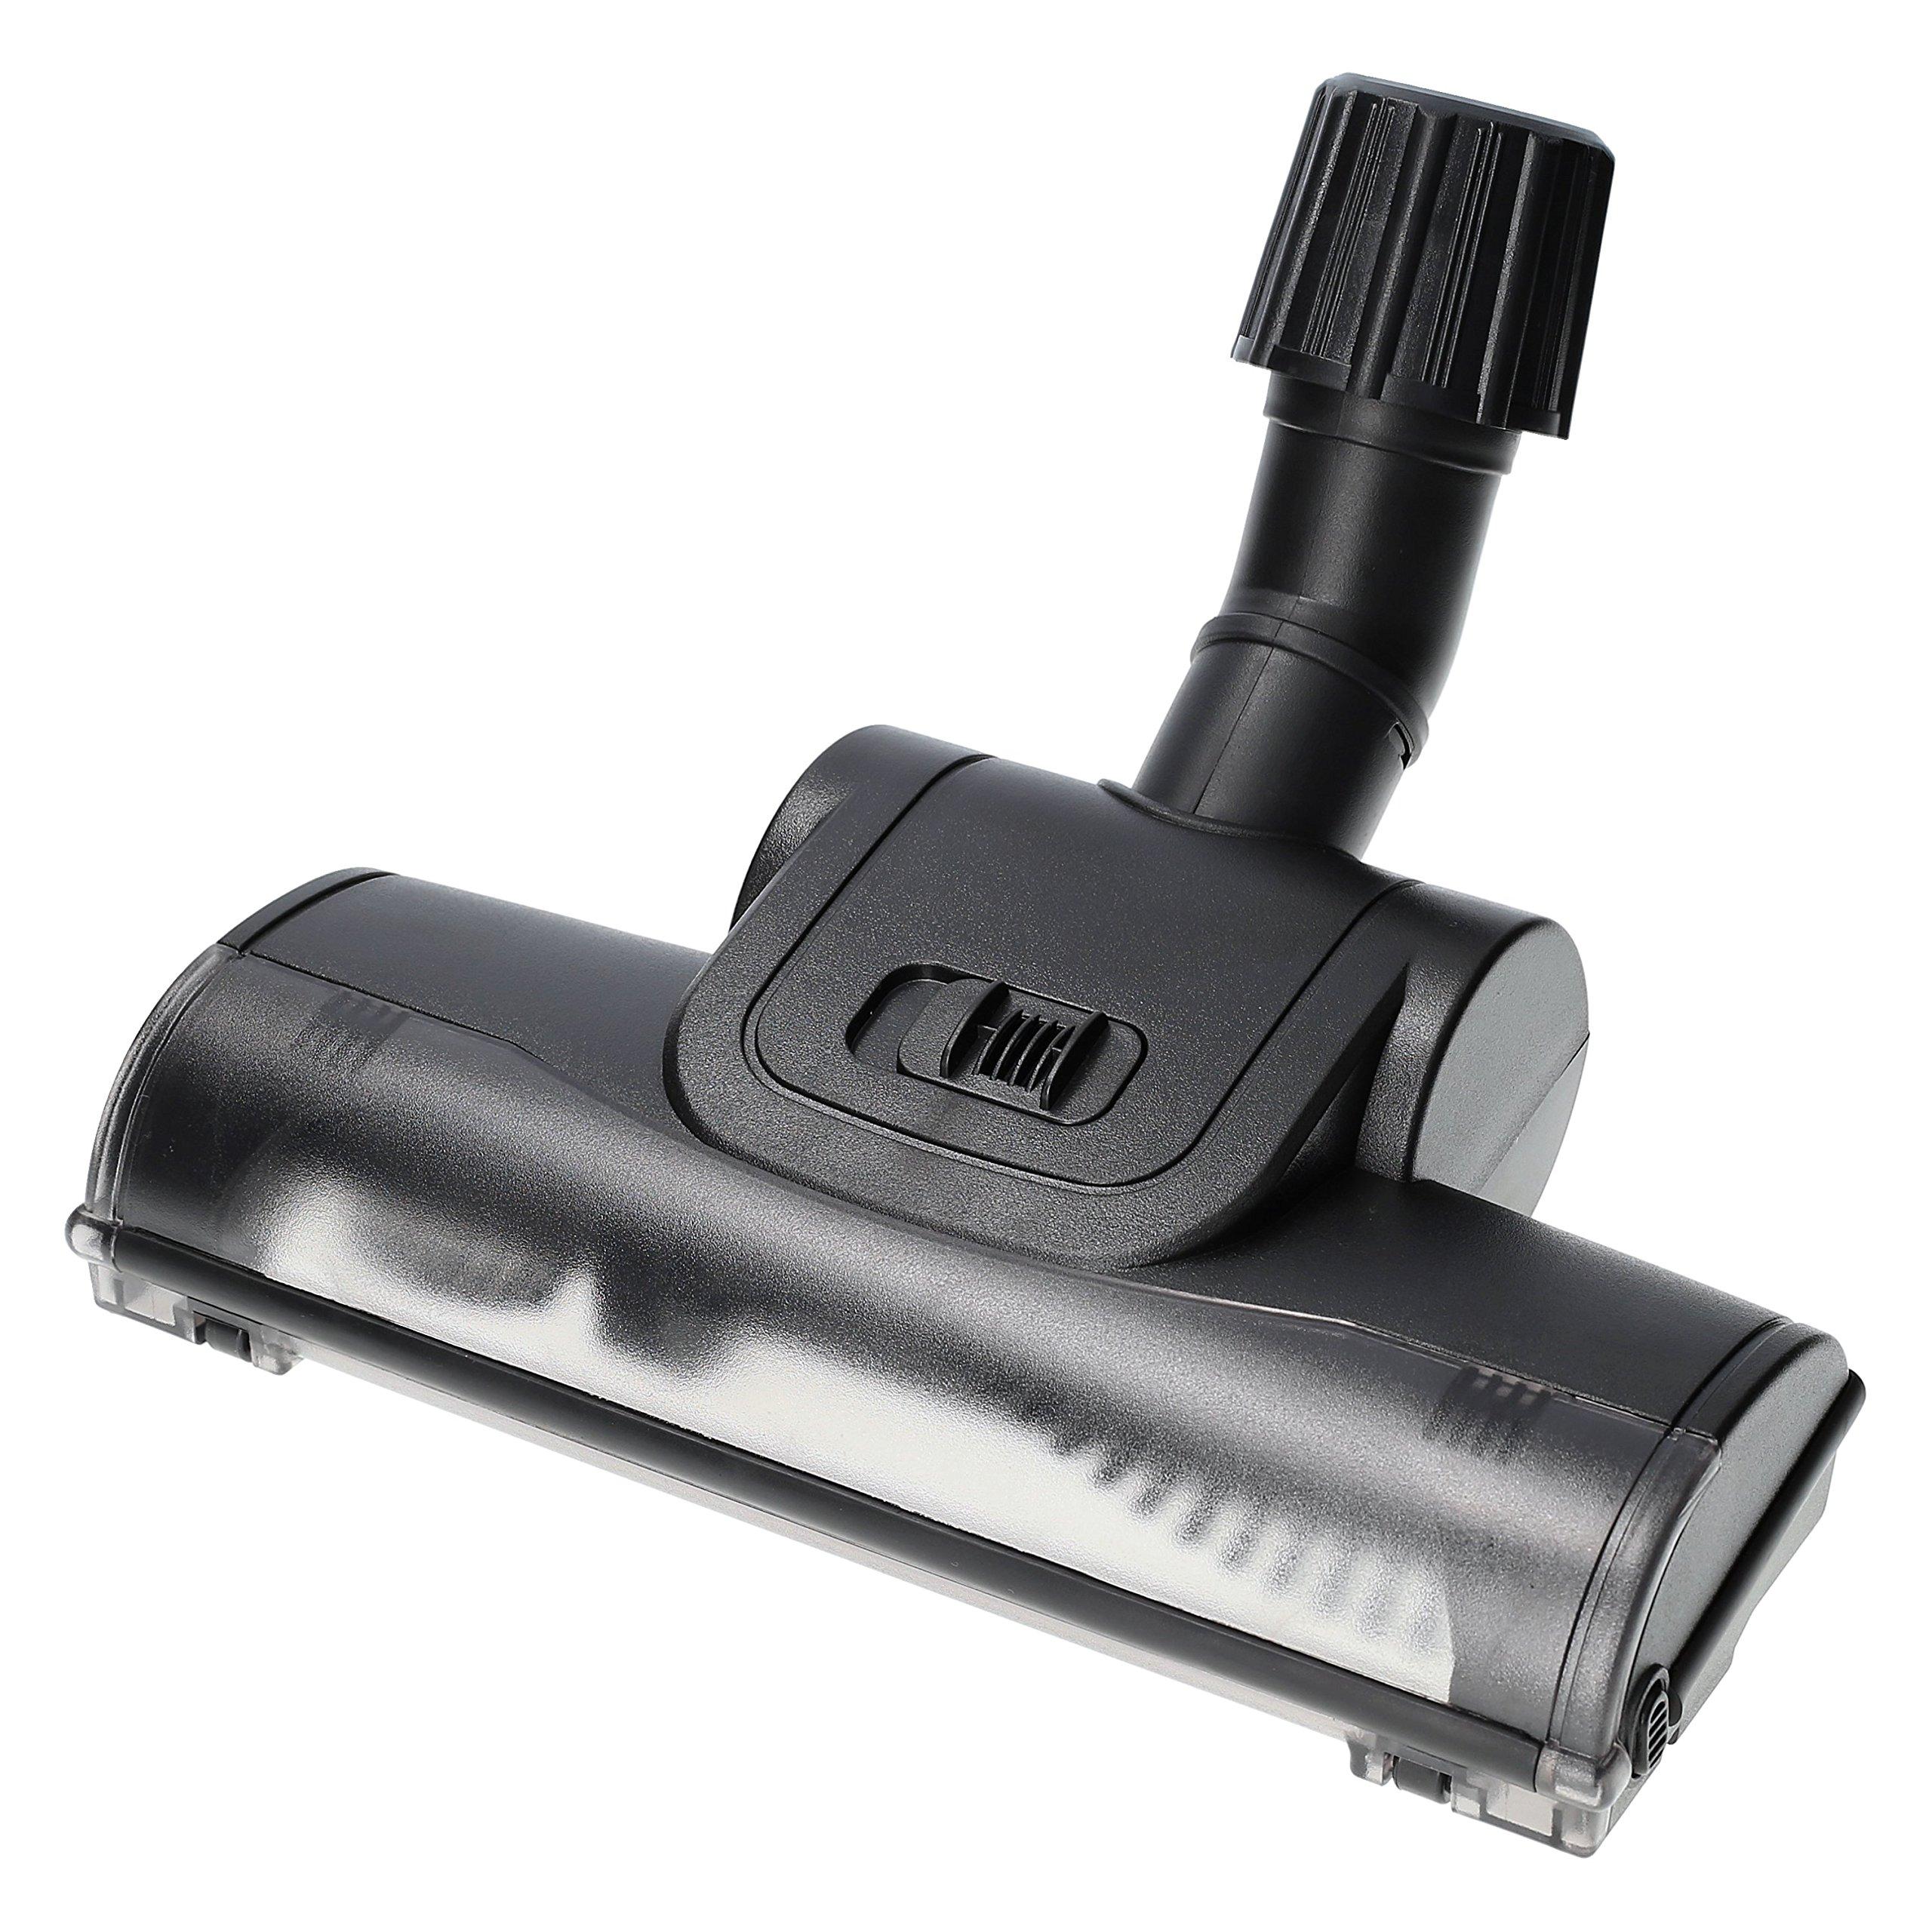 Turbo Boquilla para suelos para aspiradora KARCHER MV3 PREMIUM CAR KIT (ø32mm-38mm, con ruedas): Amazon.es: Hogar